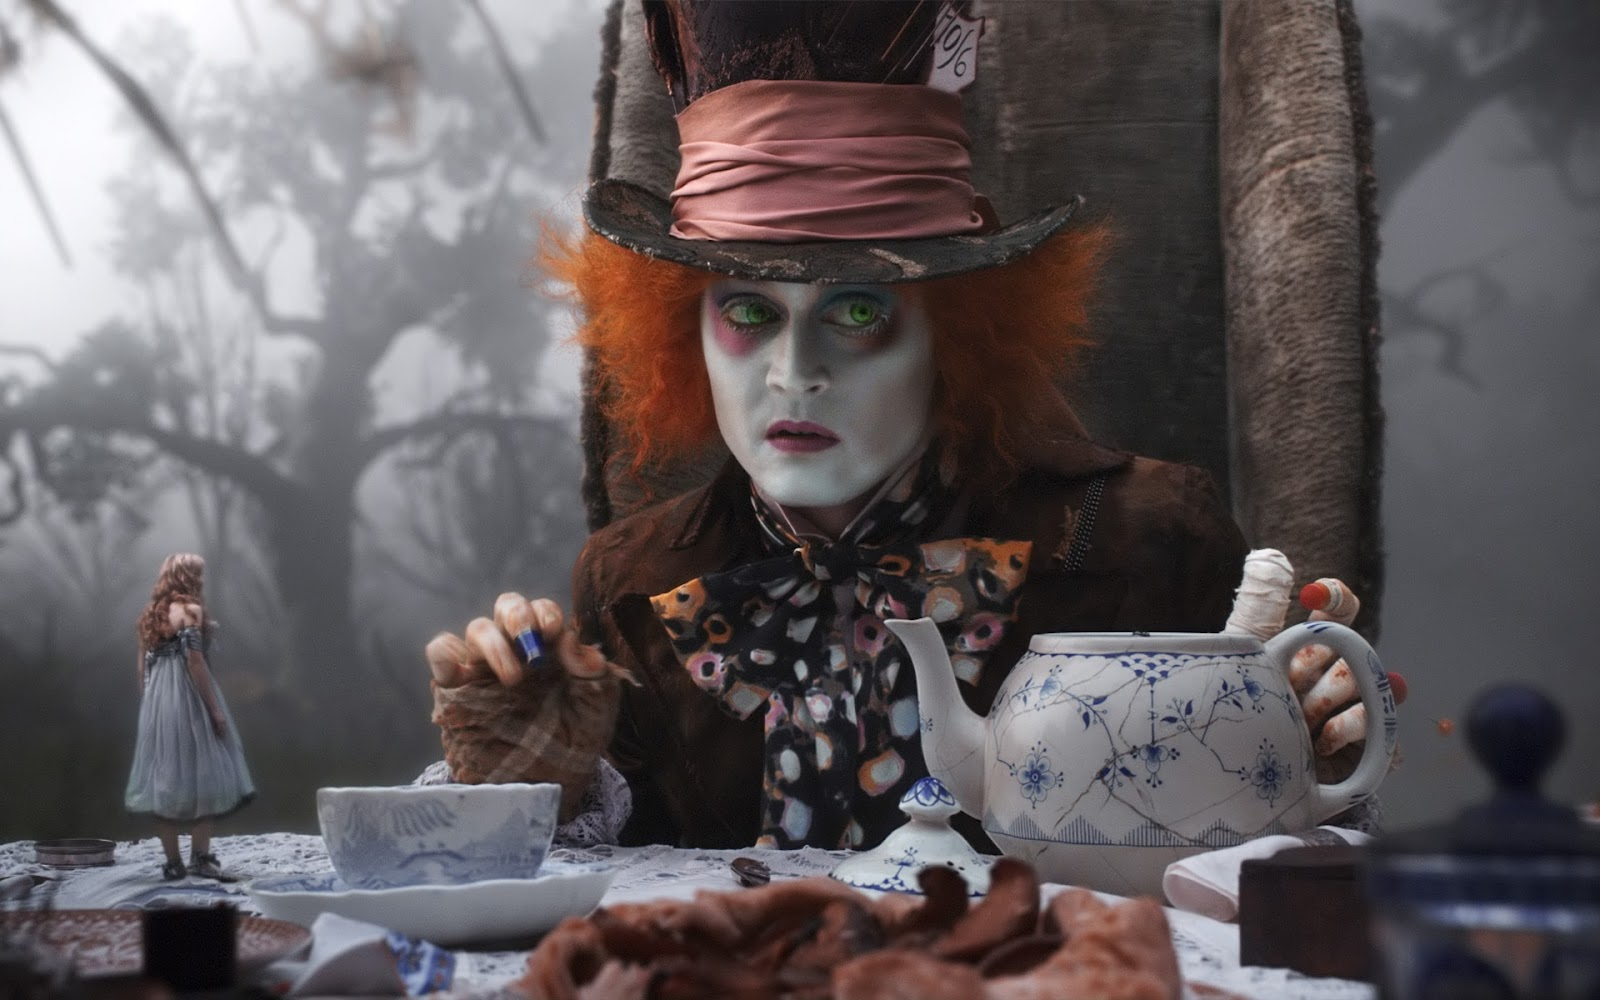 http://4.bp.blogspot.com/-5dxEmLeA_gs/T9F-dI6jTWI/AAAAAAAAFkg/ChGKnZchkbE/s1600/Mad-Hatter-tea.jpg